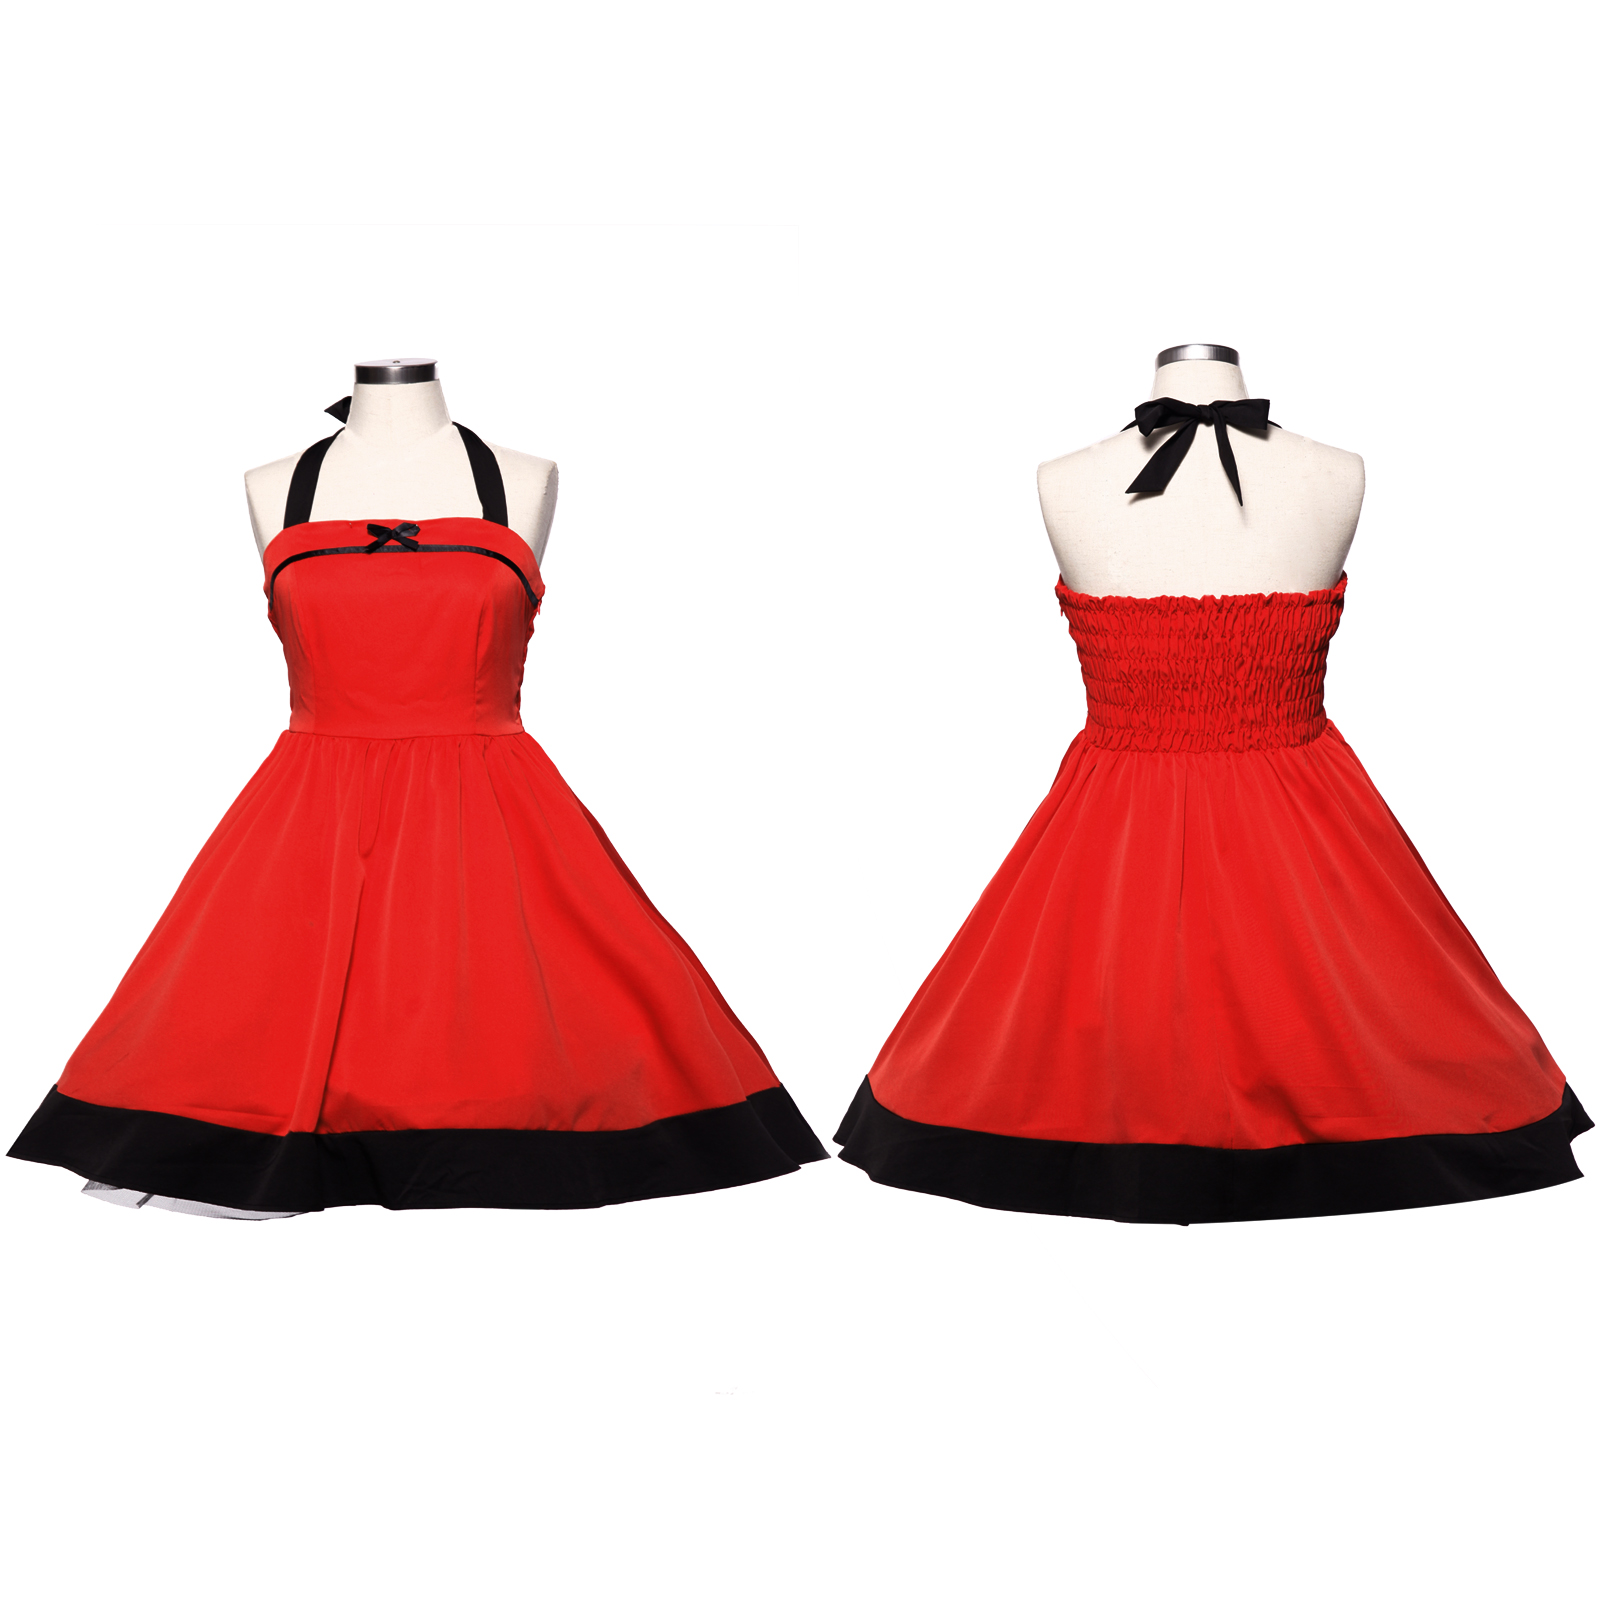 28f328918 vestidos para bailar swing